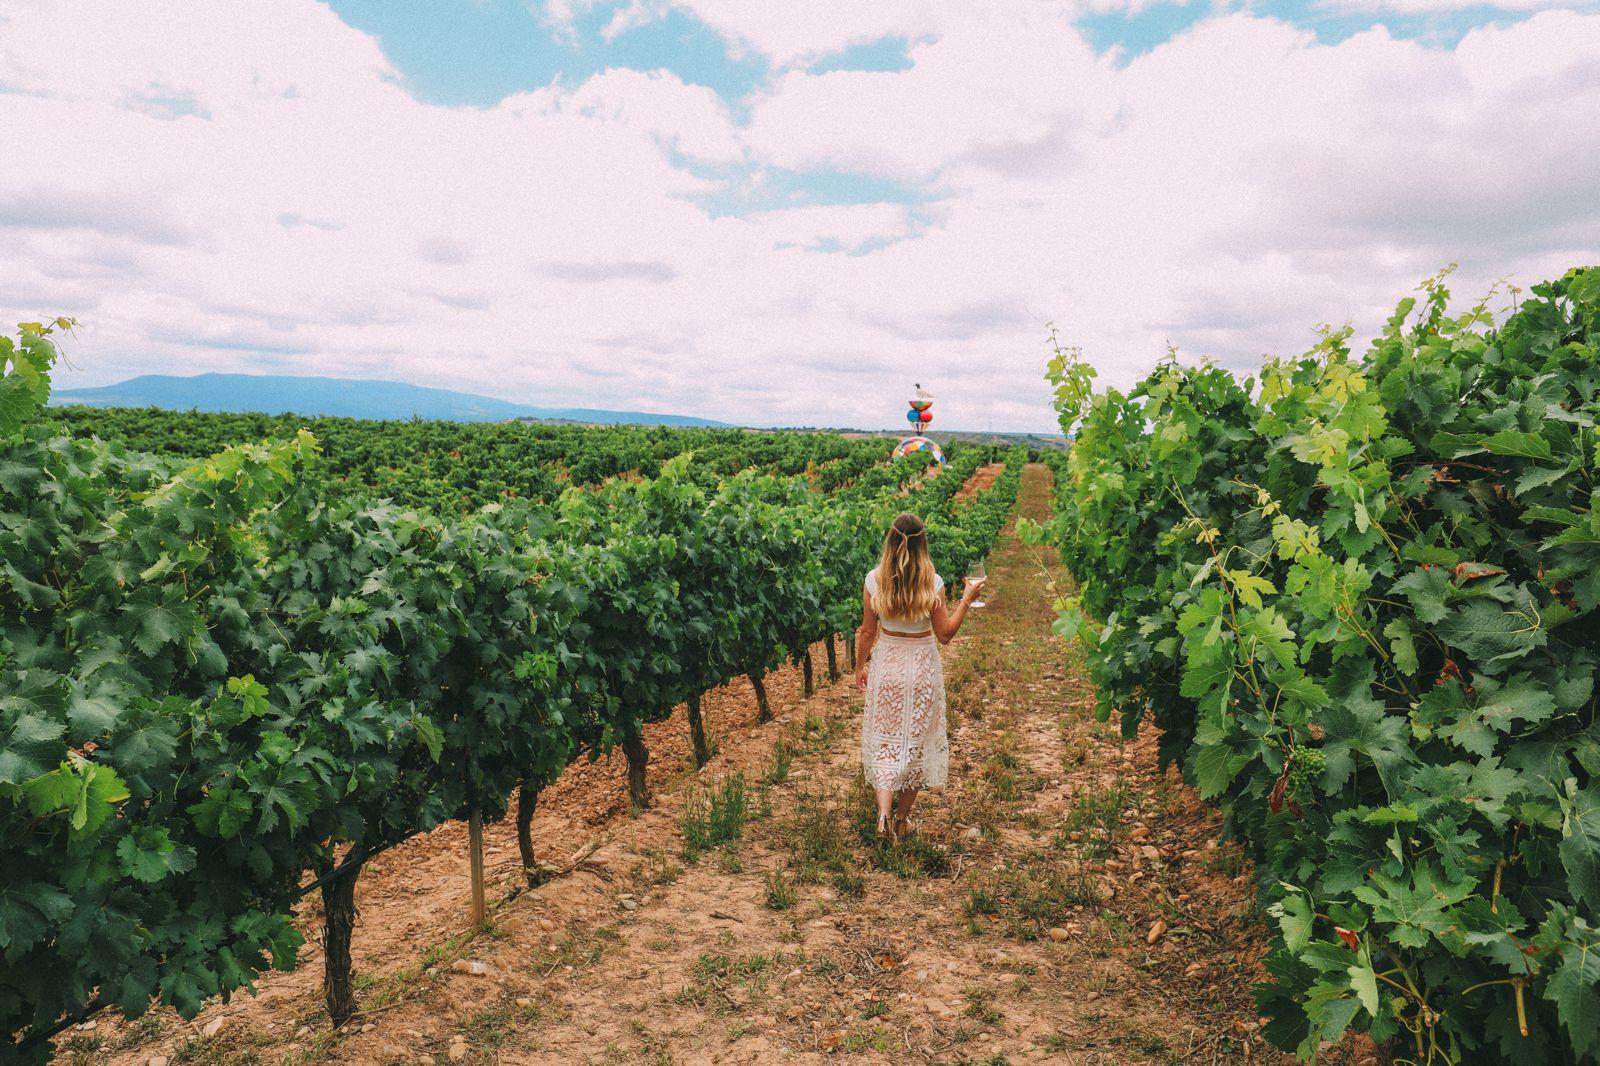 Spanish Vineyard Stock Photos & Spanish Vineyard Stock Images - Alamy